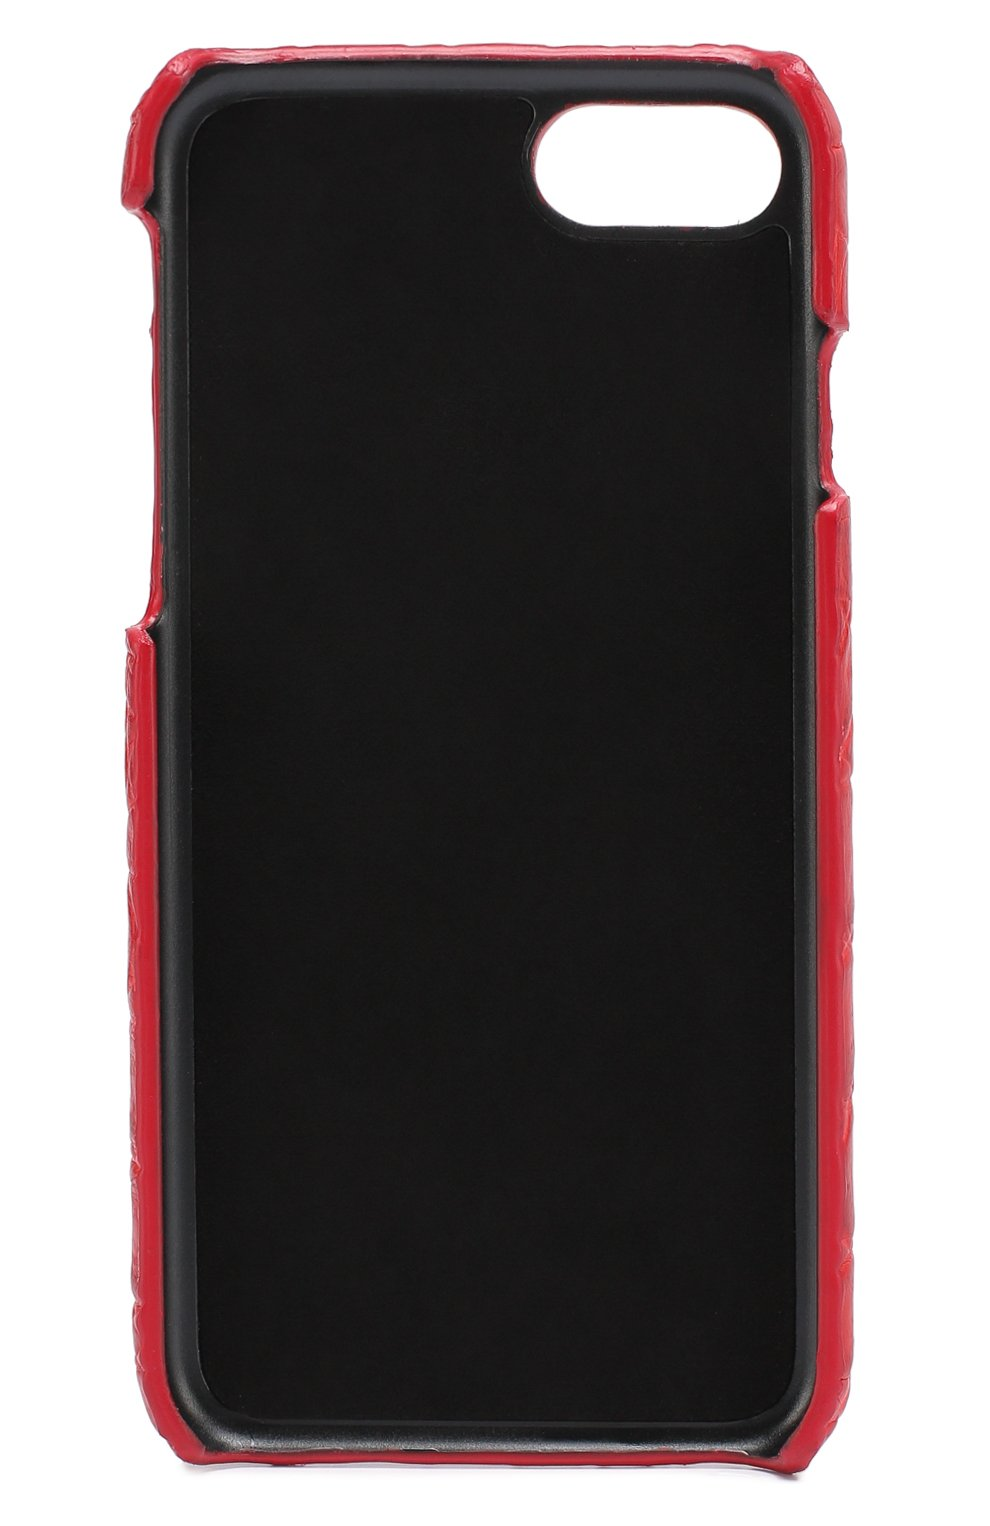 Чехол для iPhone 7 из кожи крокодила Dolce & Gabbana  | Фото №2